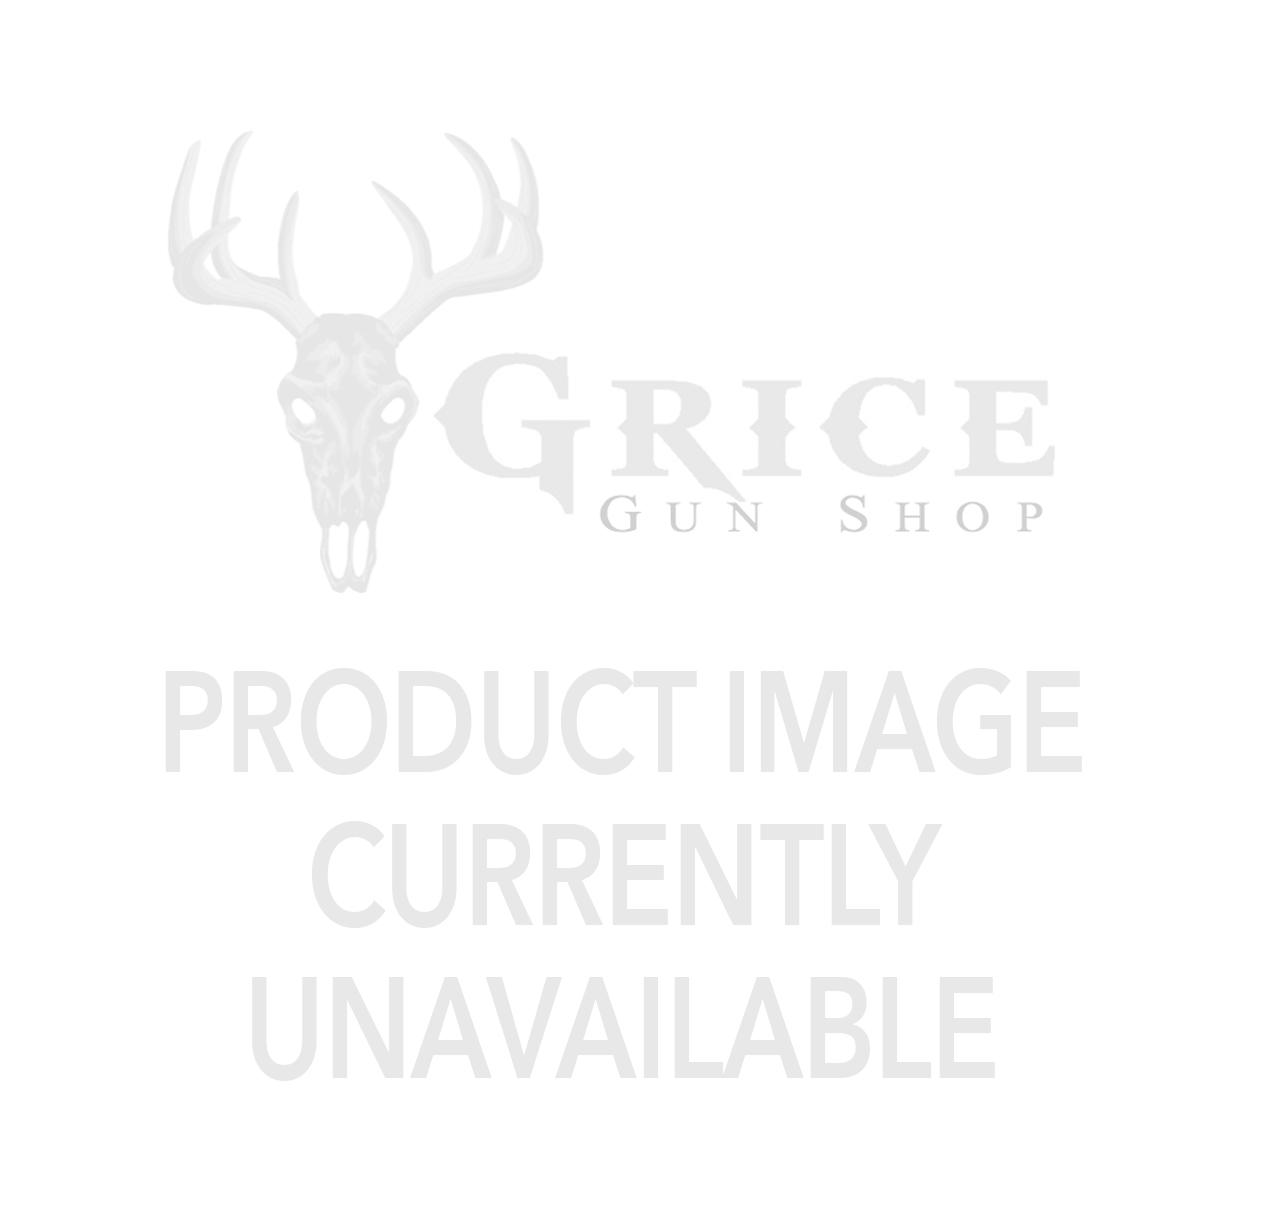 CrimsonTrace - LaserGrips-S&W M&P M2.0 9MM/40S&W & 45ACP Green